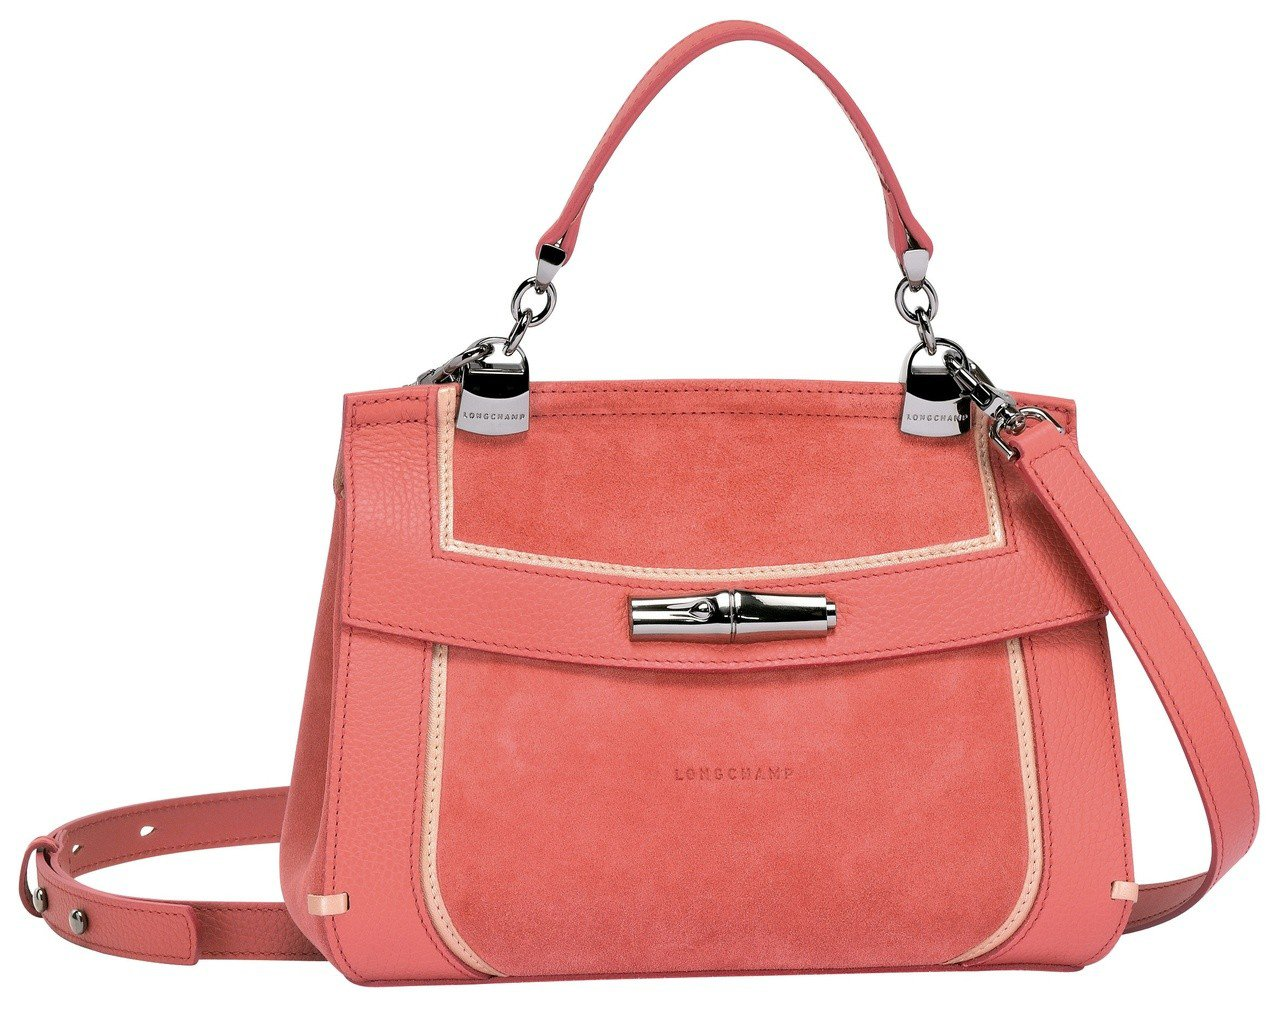 Madeleine無花果色斜背袋,售價28,600元。圖/LONGCHAMP提供